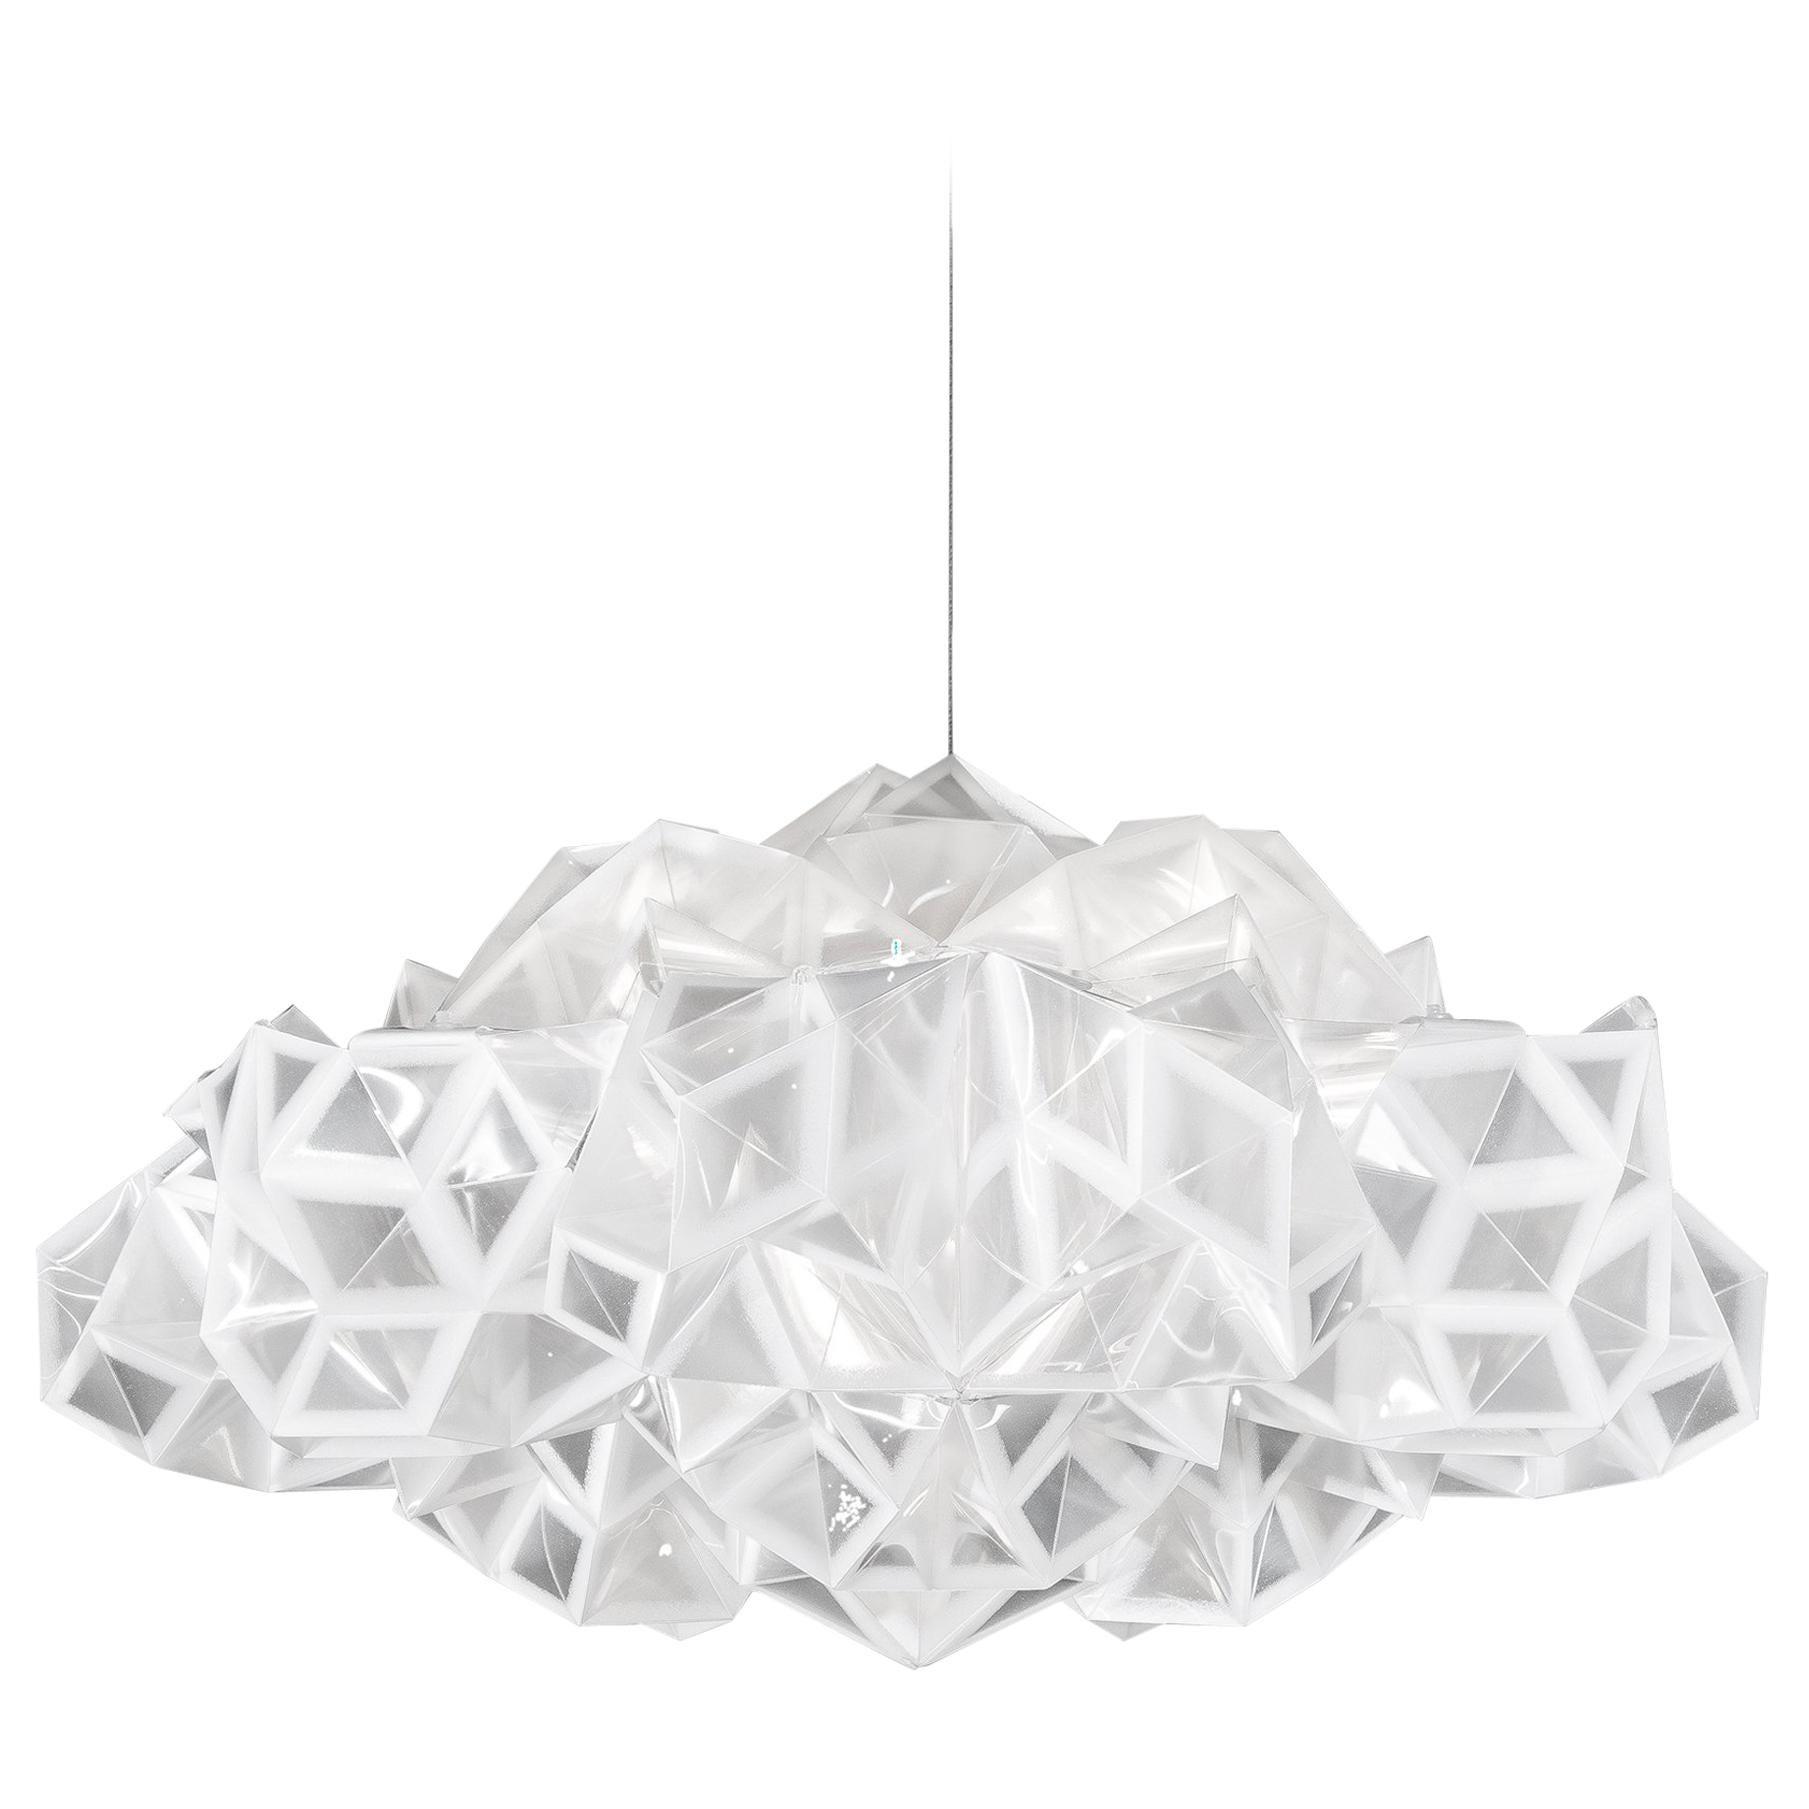 SLAMP Drusa Pendant Light in White by Adriano Rachele